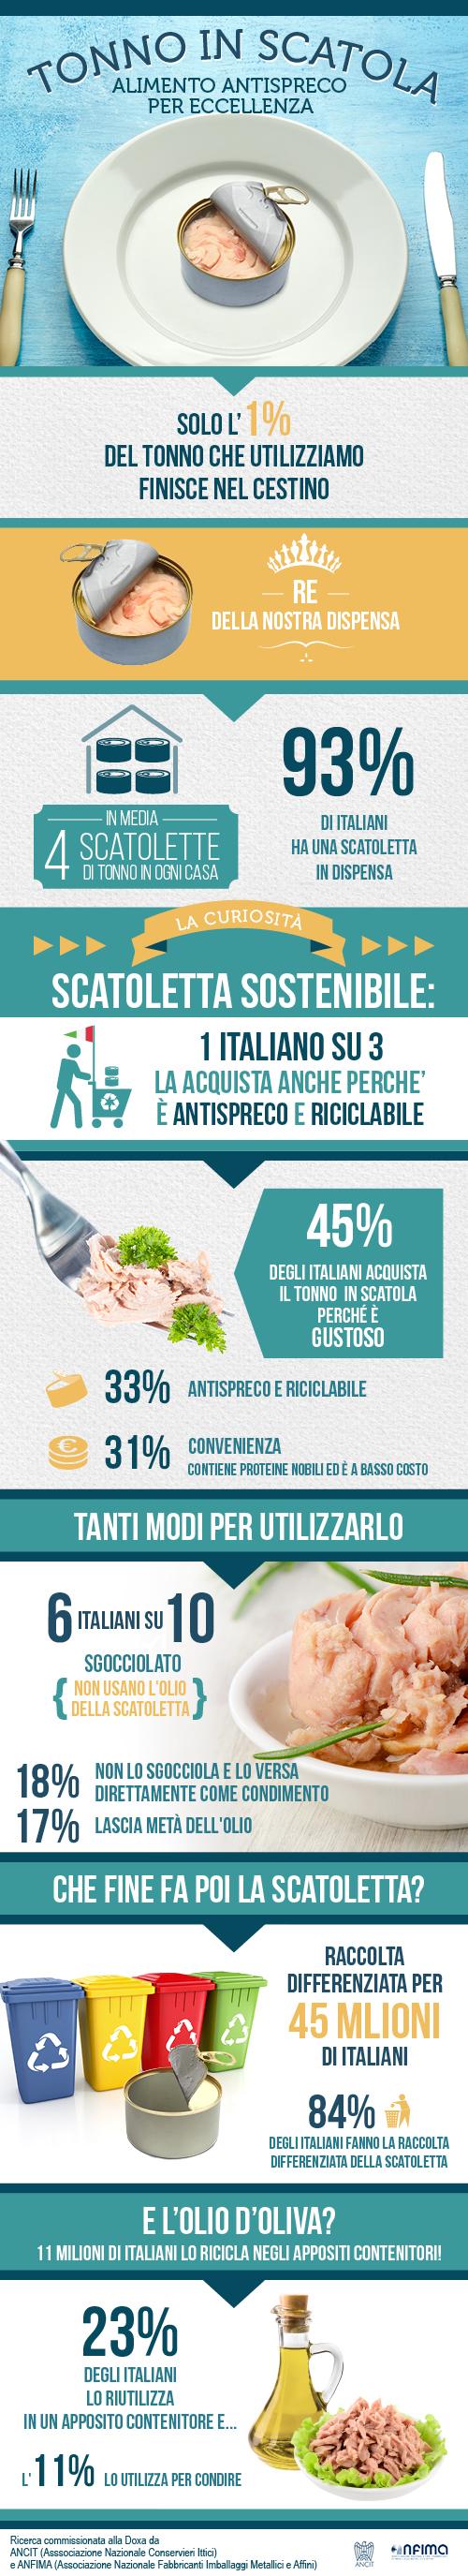 infograficatonnoescatoletta.jpg